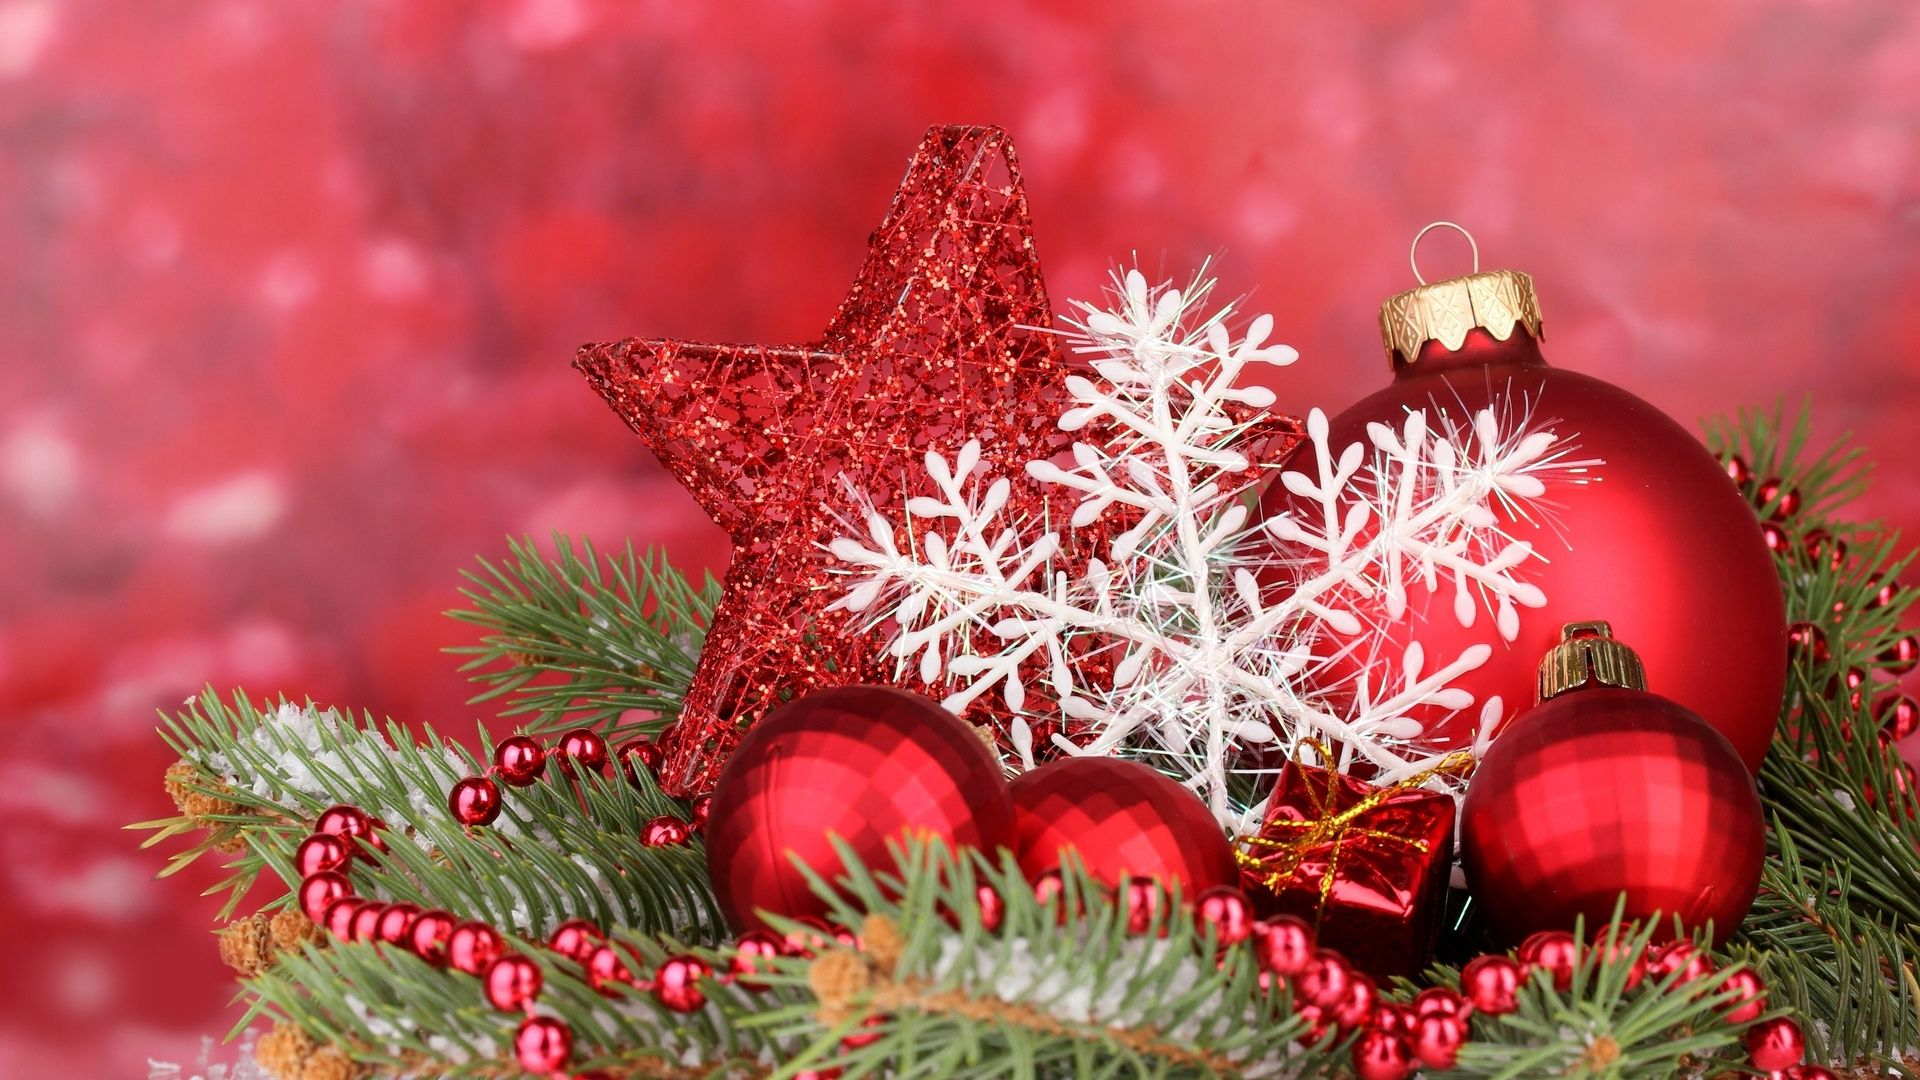 christmas ornaments Christmas desktop, Christmas desktop